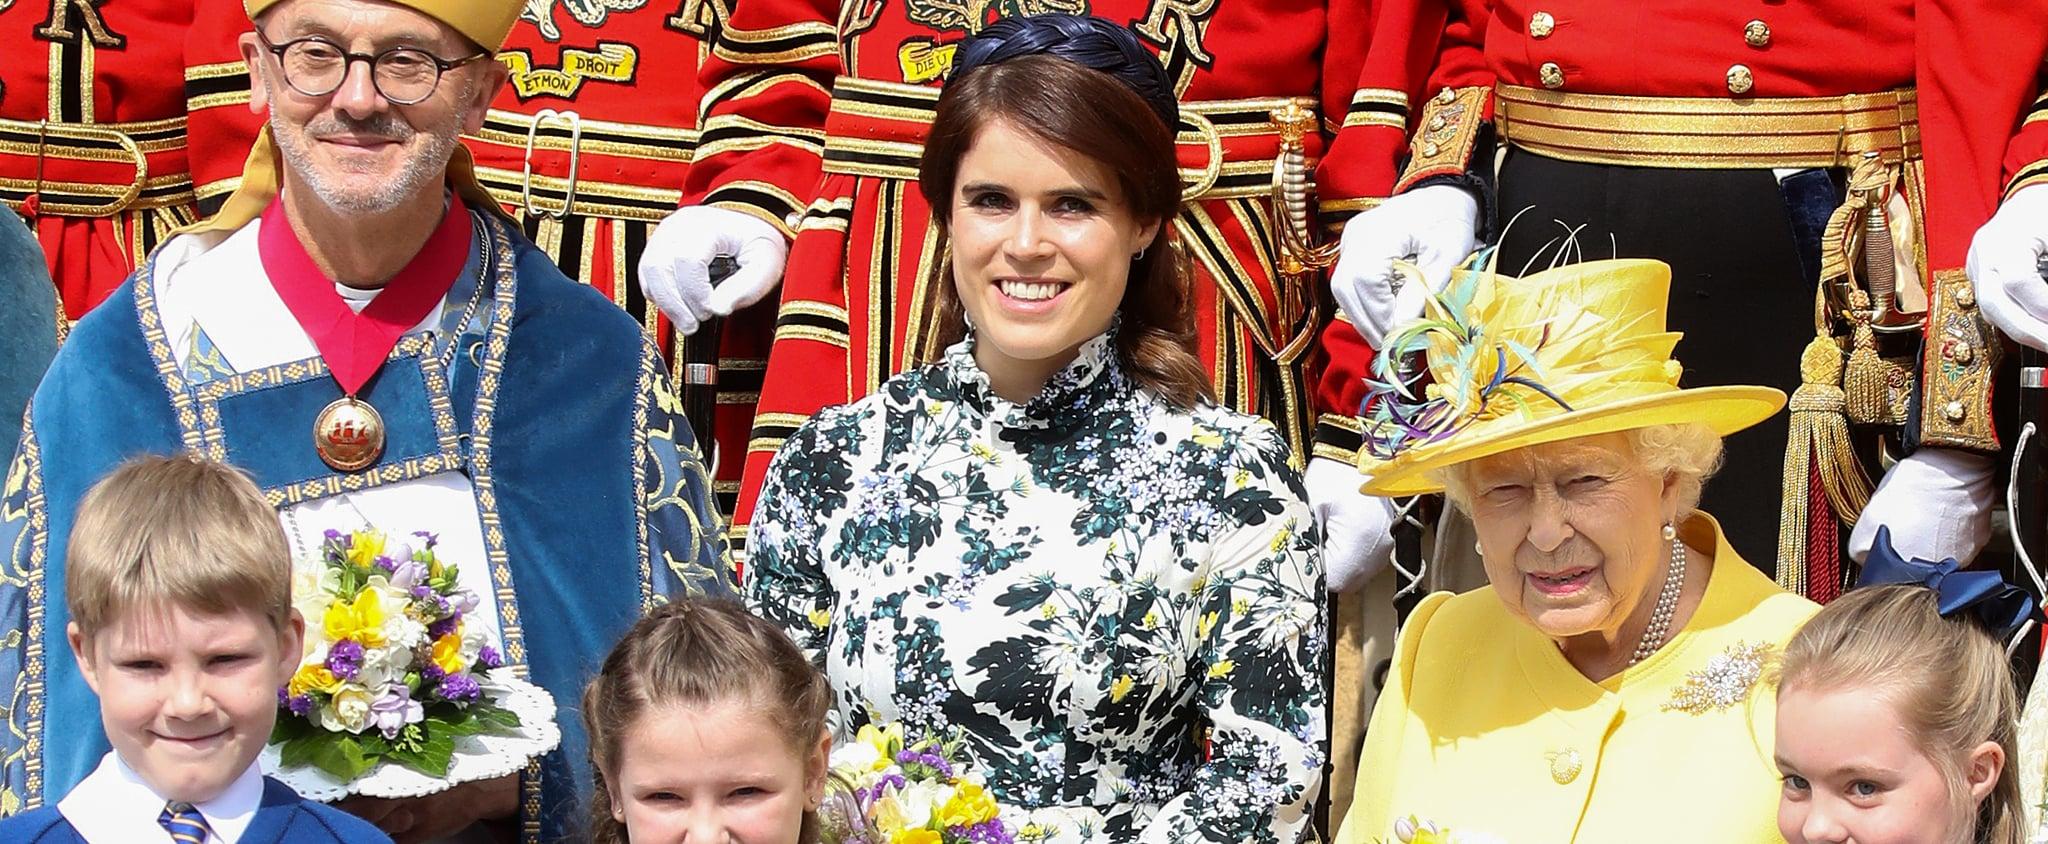 Princess Eugenie Erdem Dress April 2019